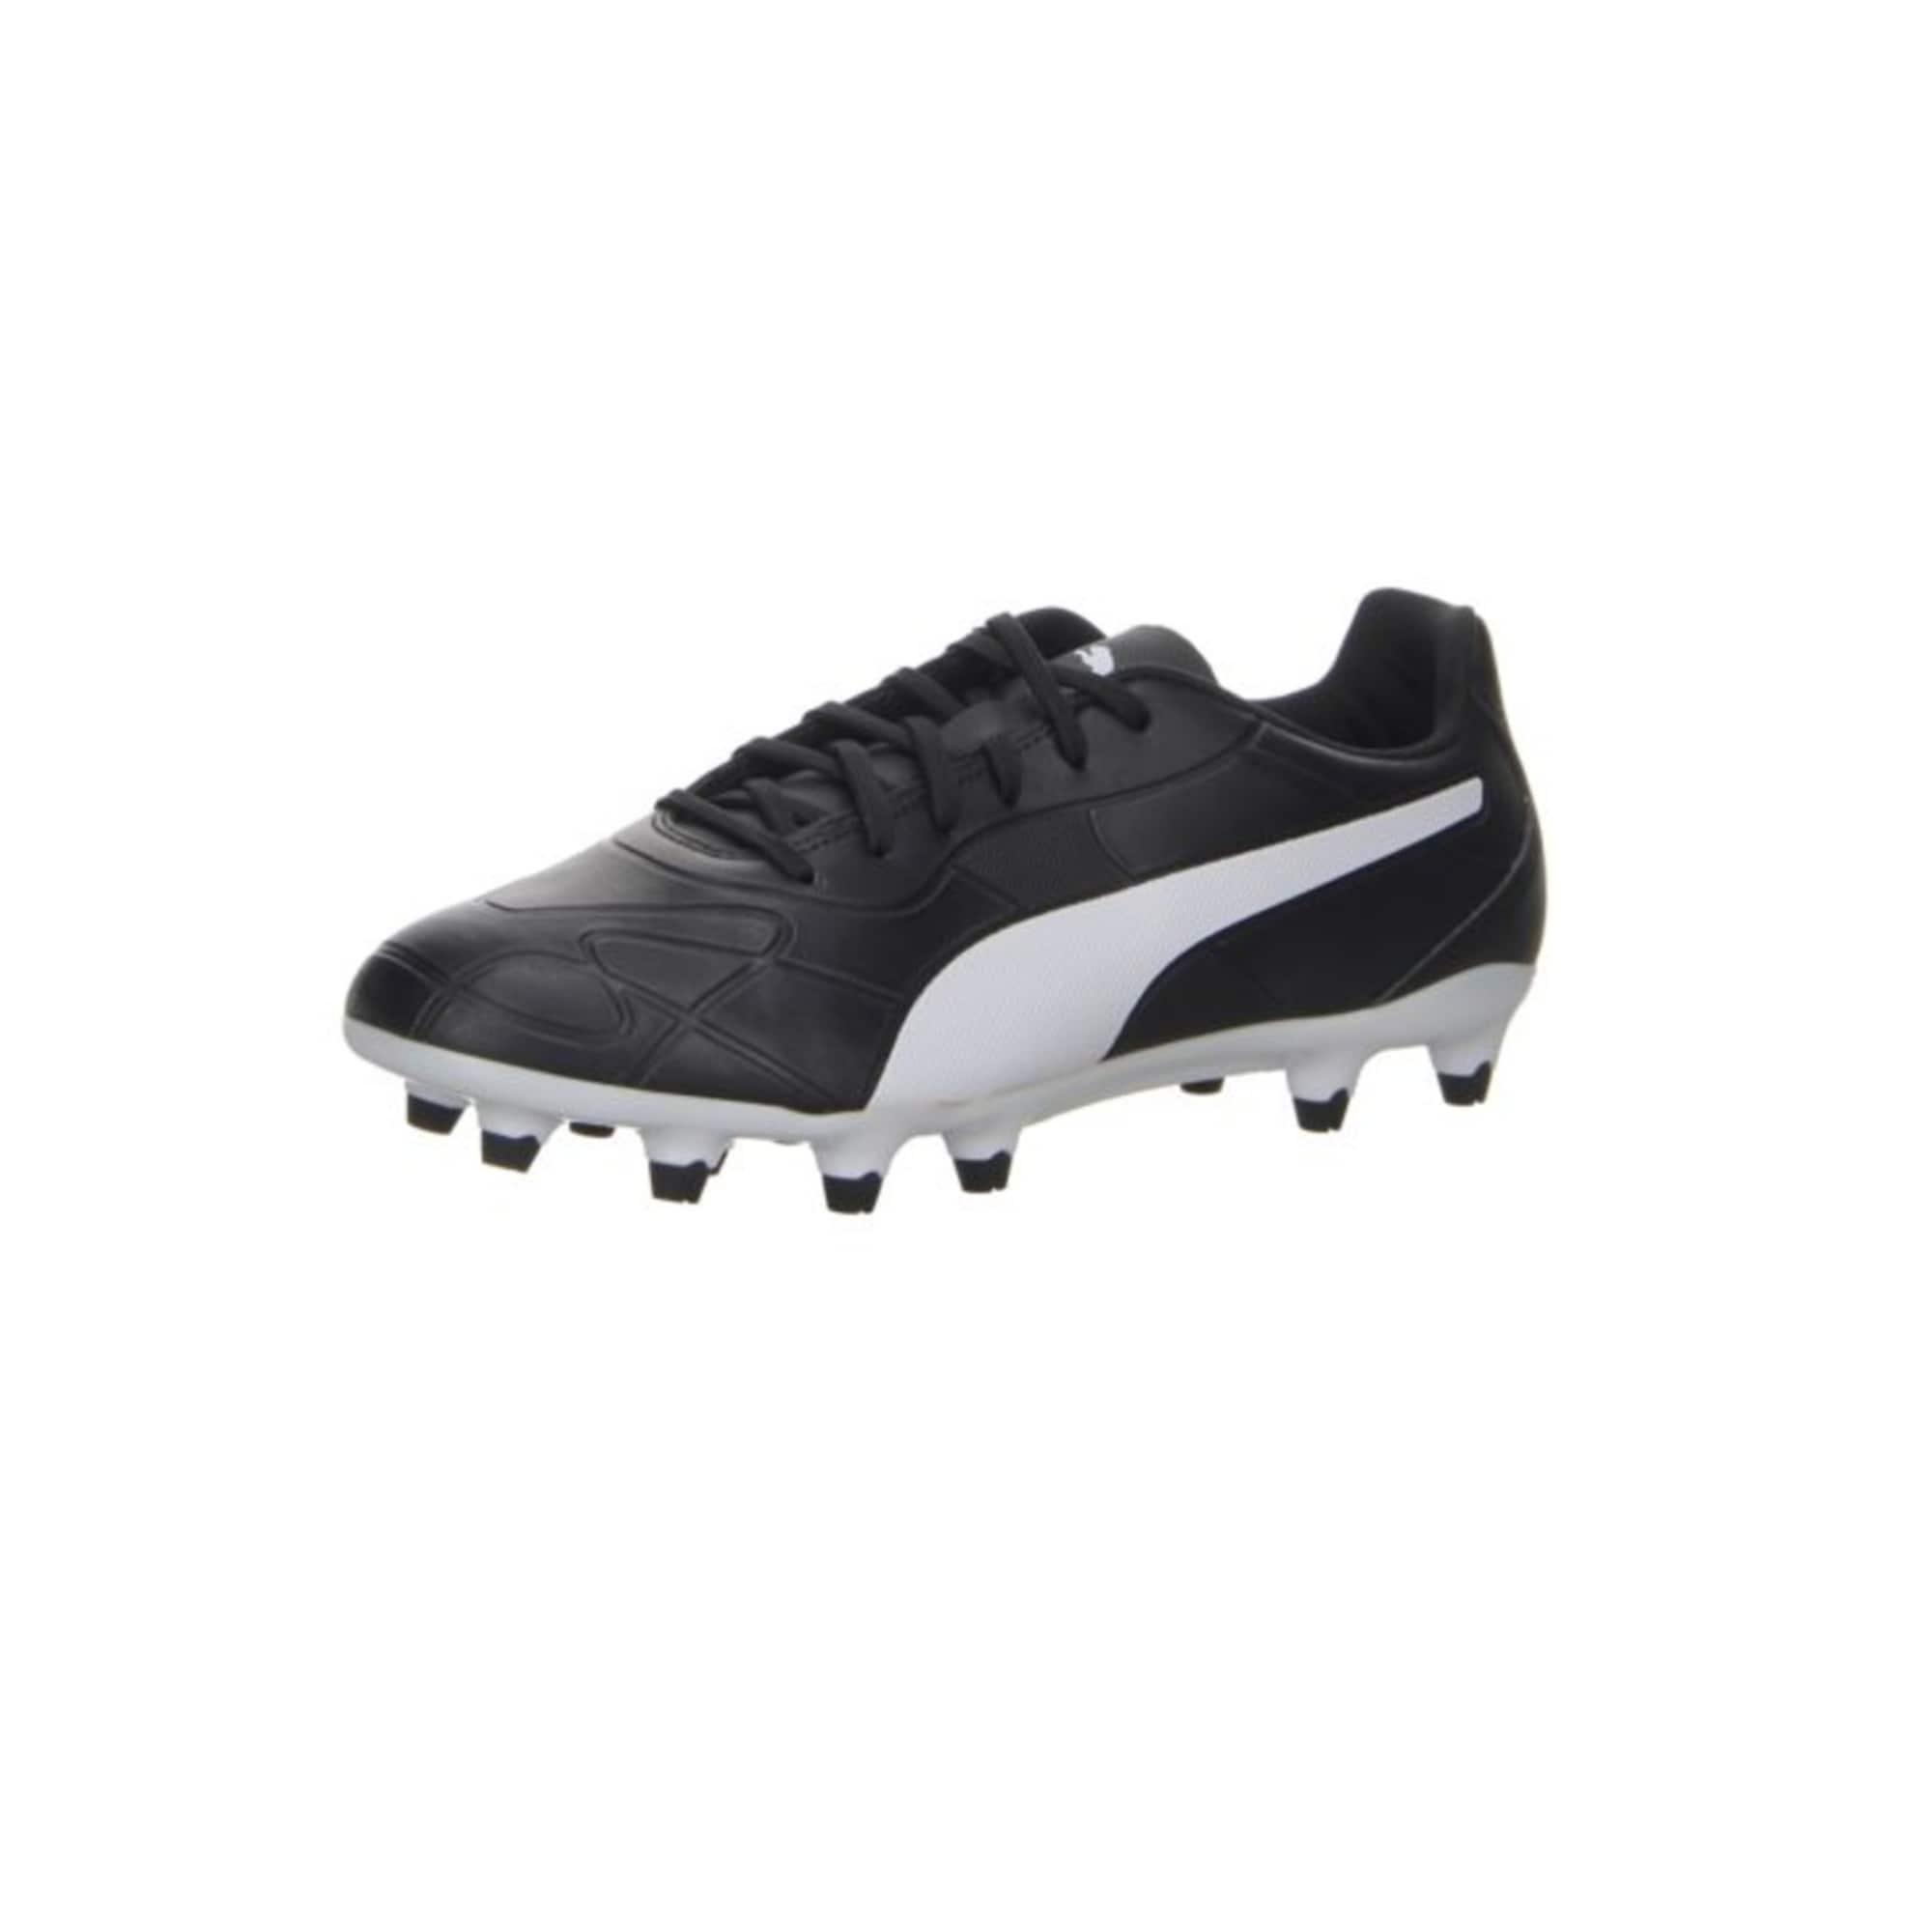 PUMA Futbolo bateliai juoda / balta